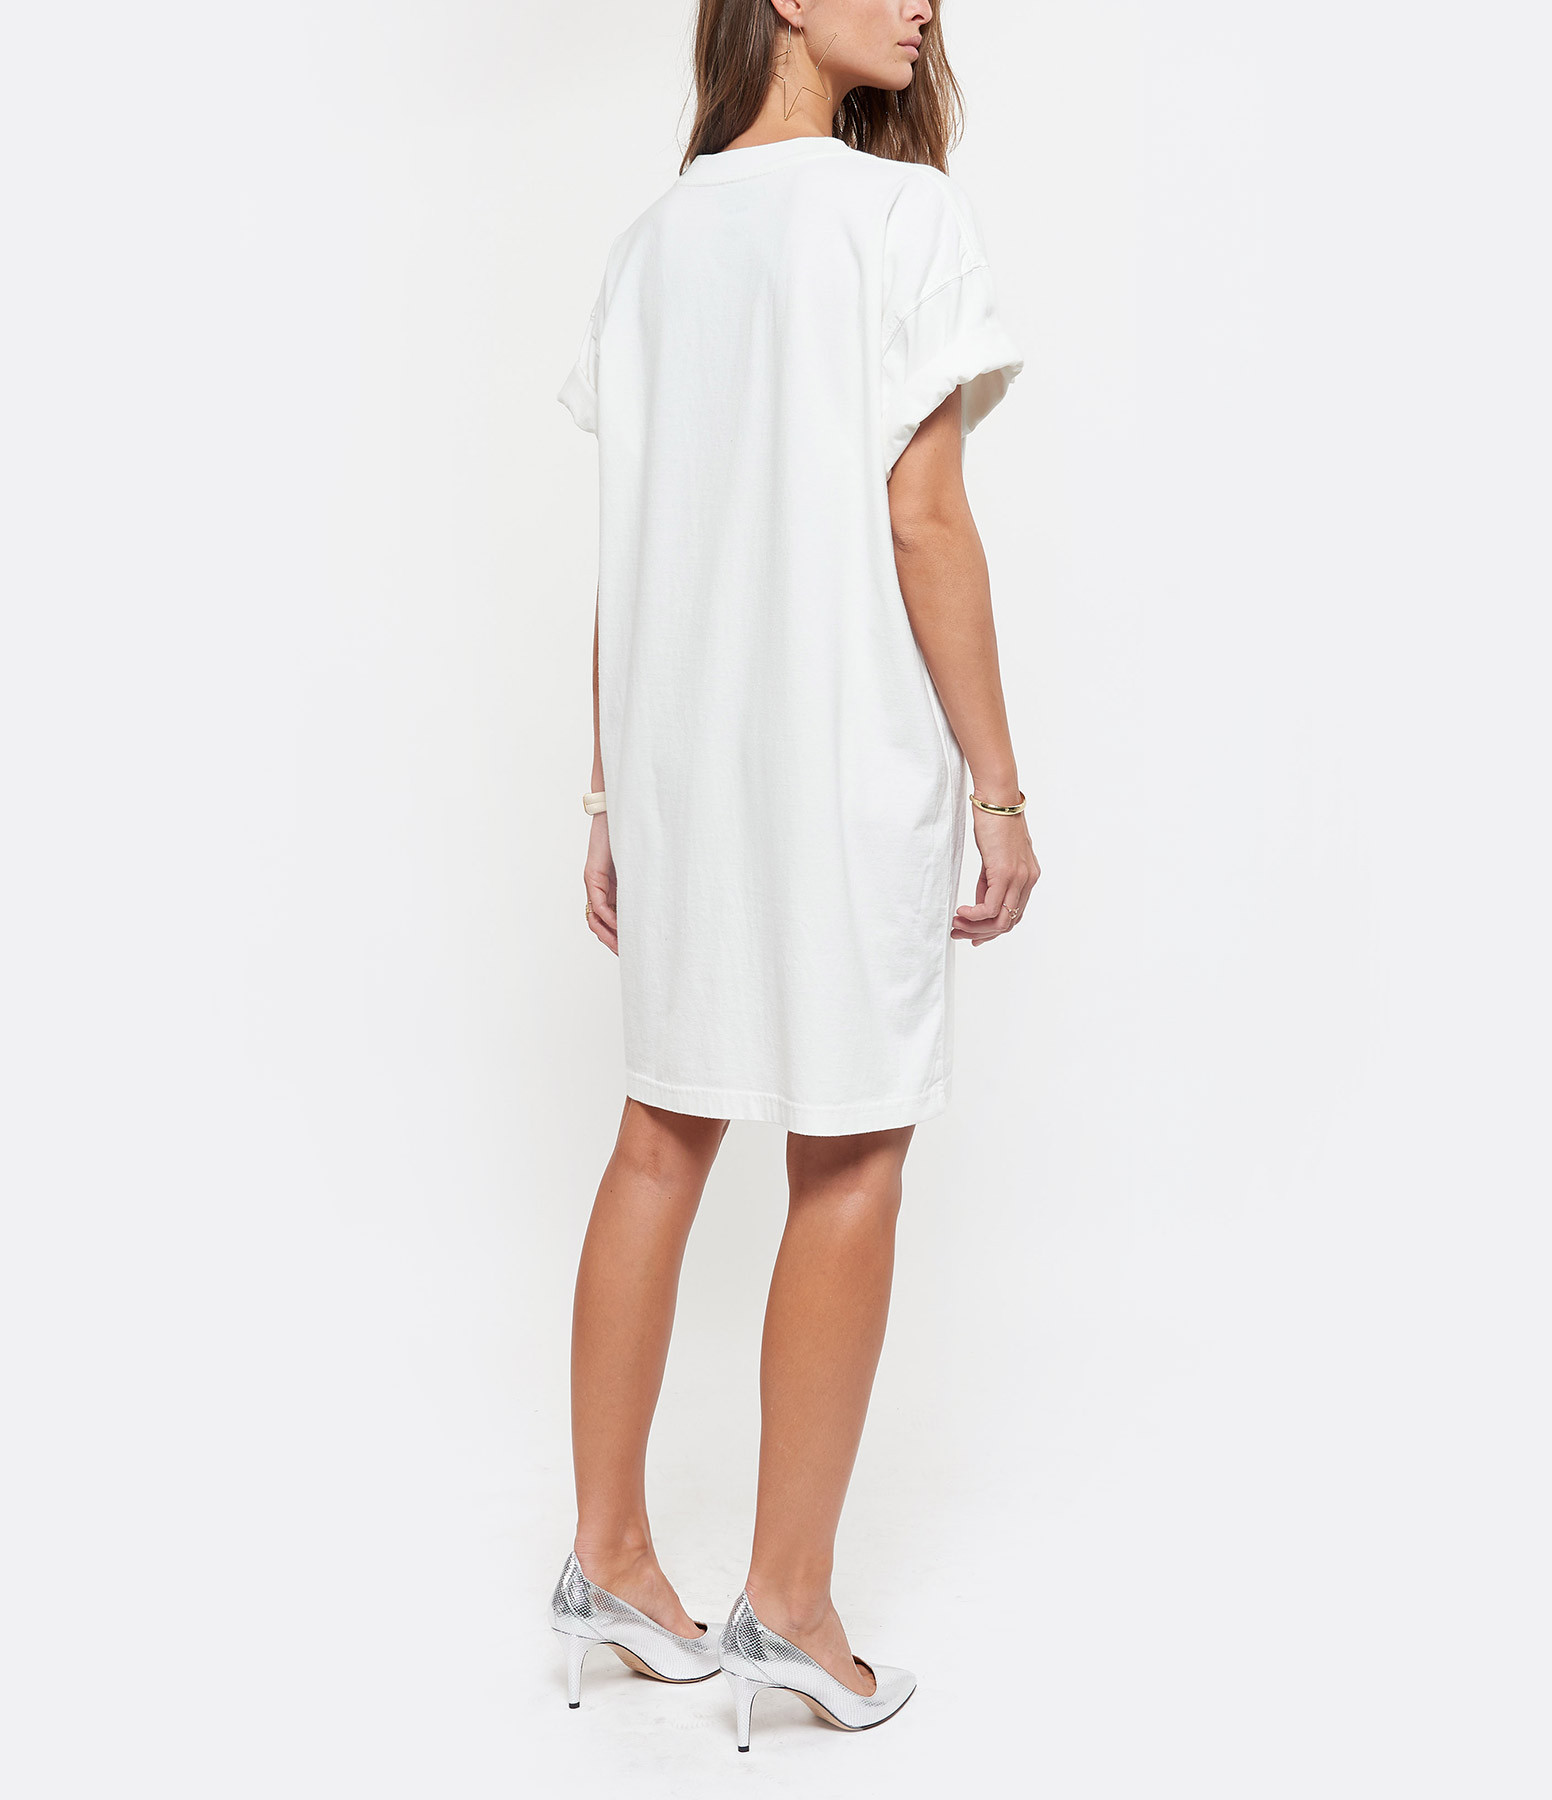 NEWTONE - Robe Furies Coton Beige